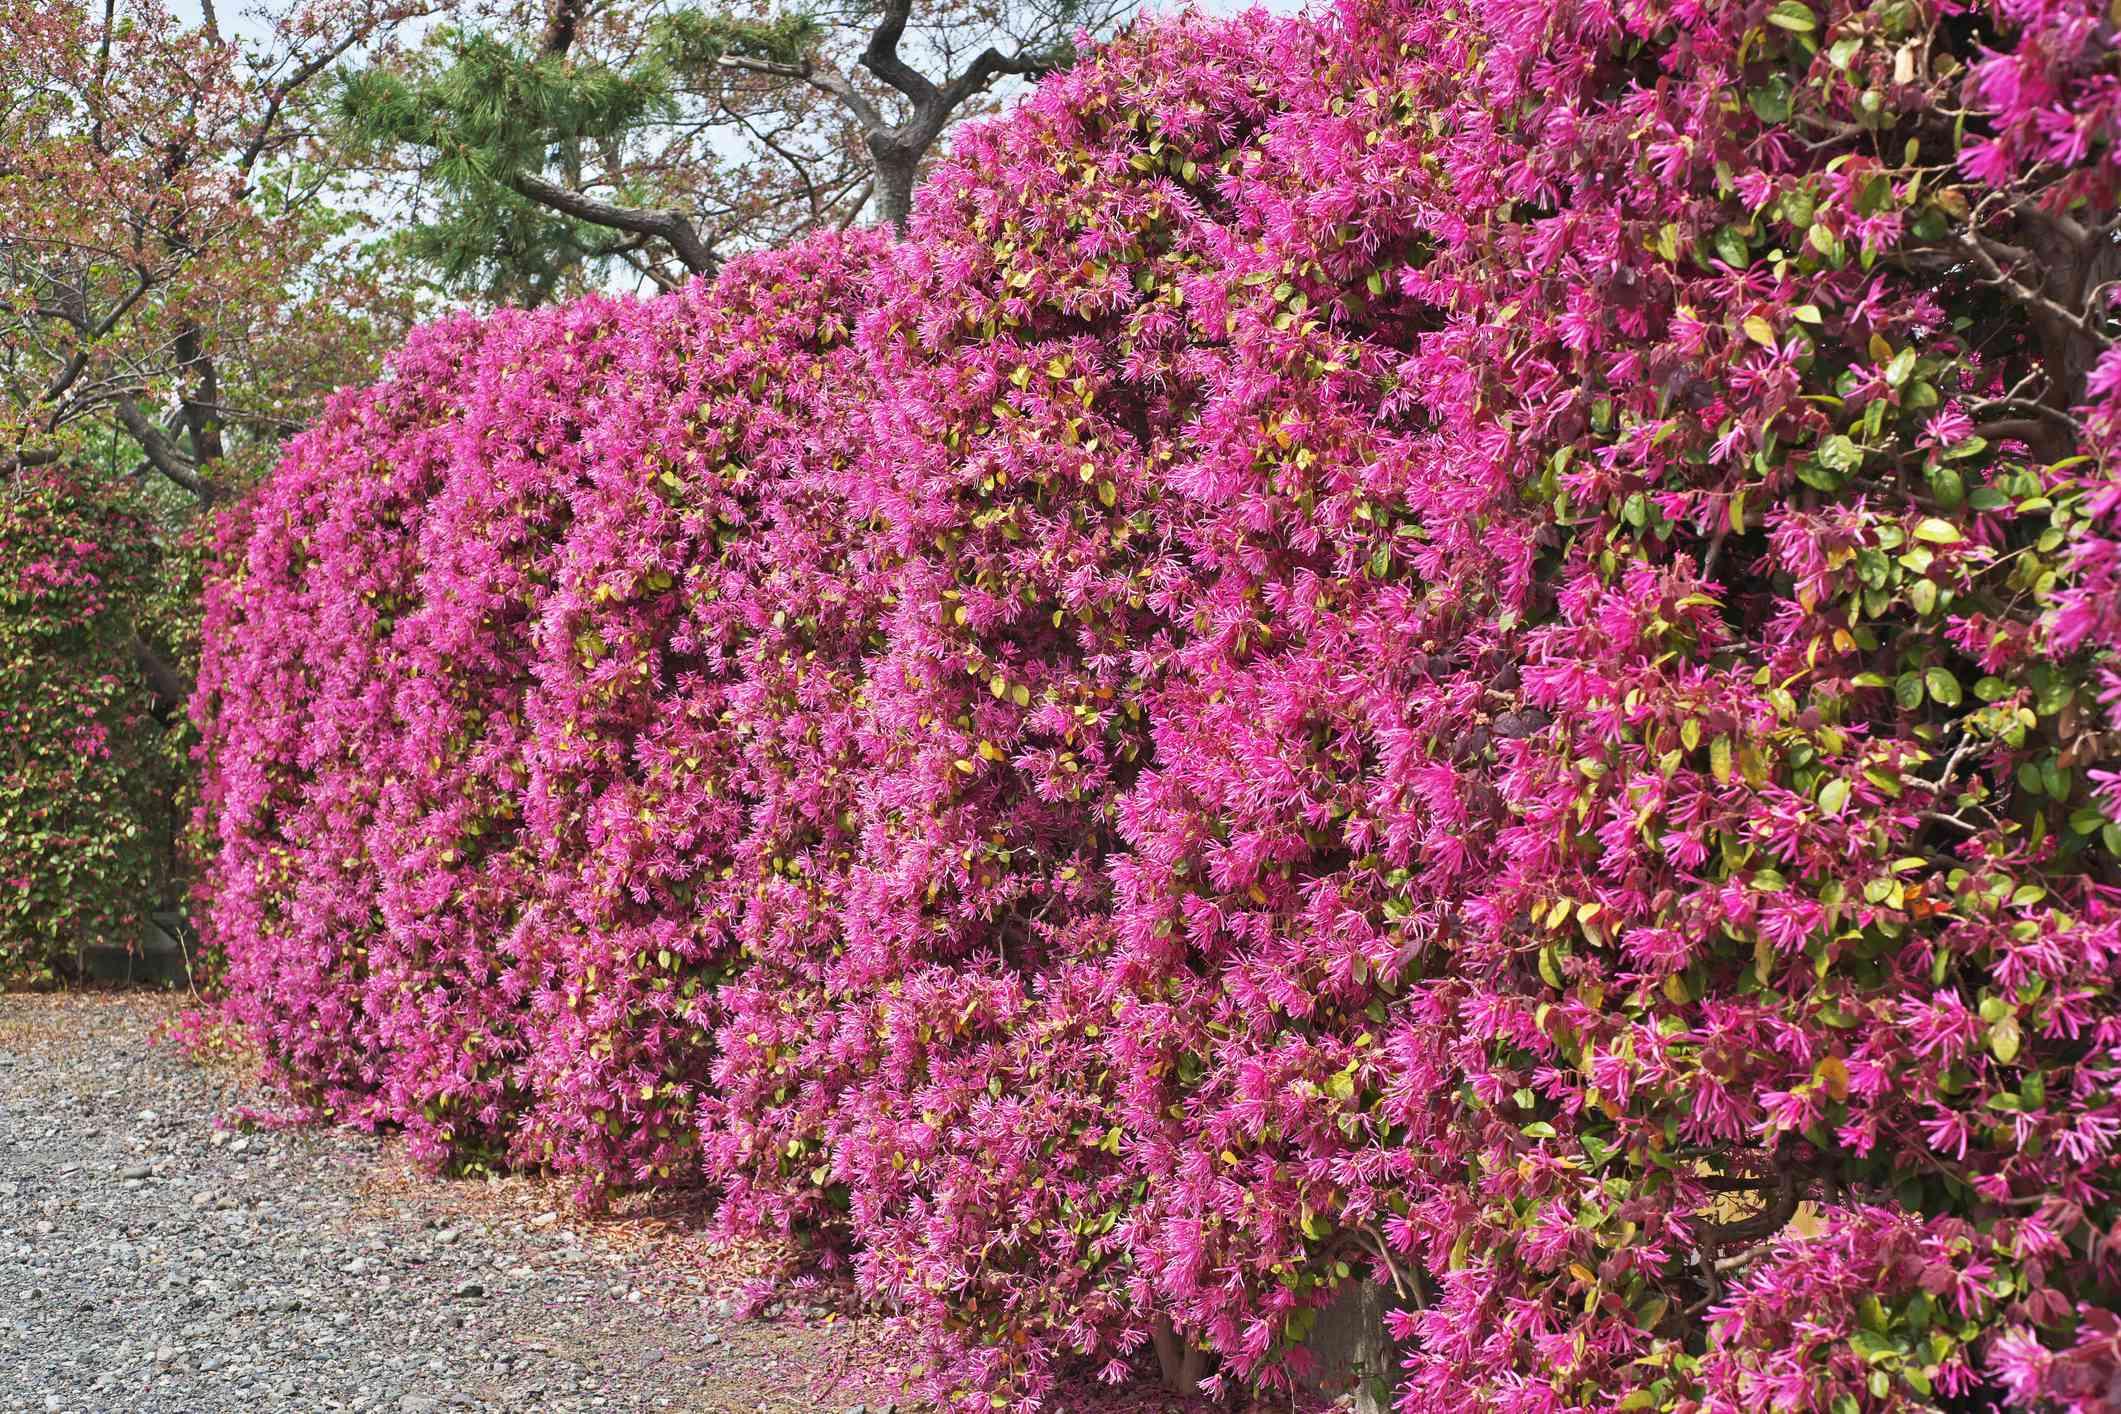 Loropetalum hedge in Japan